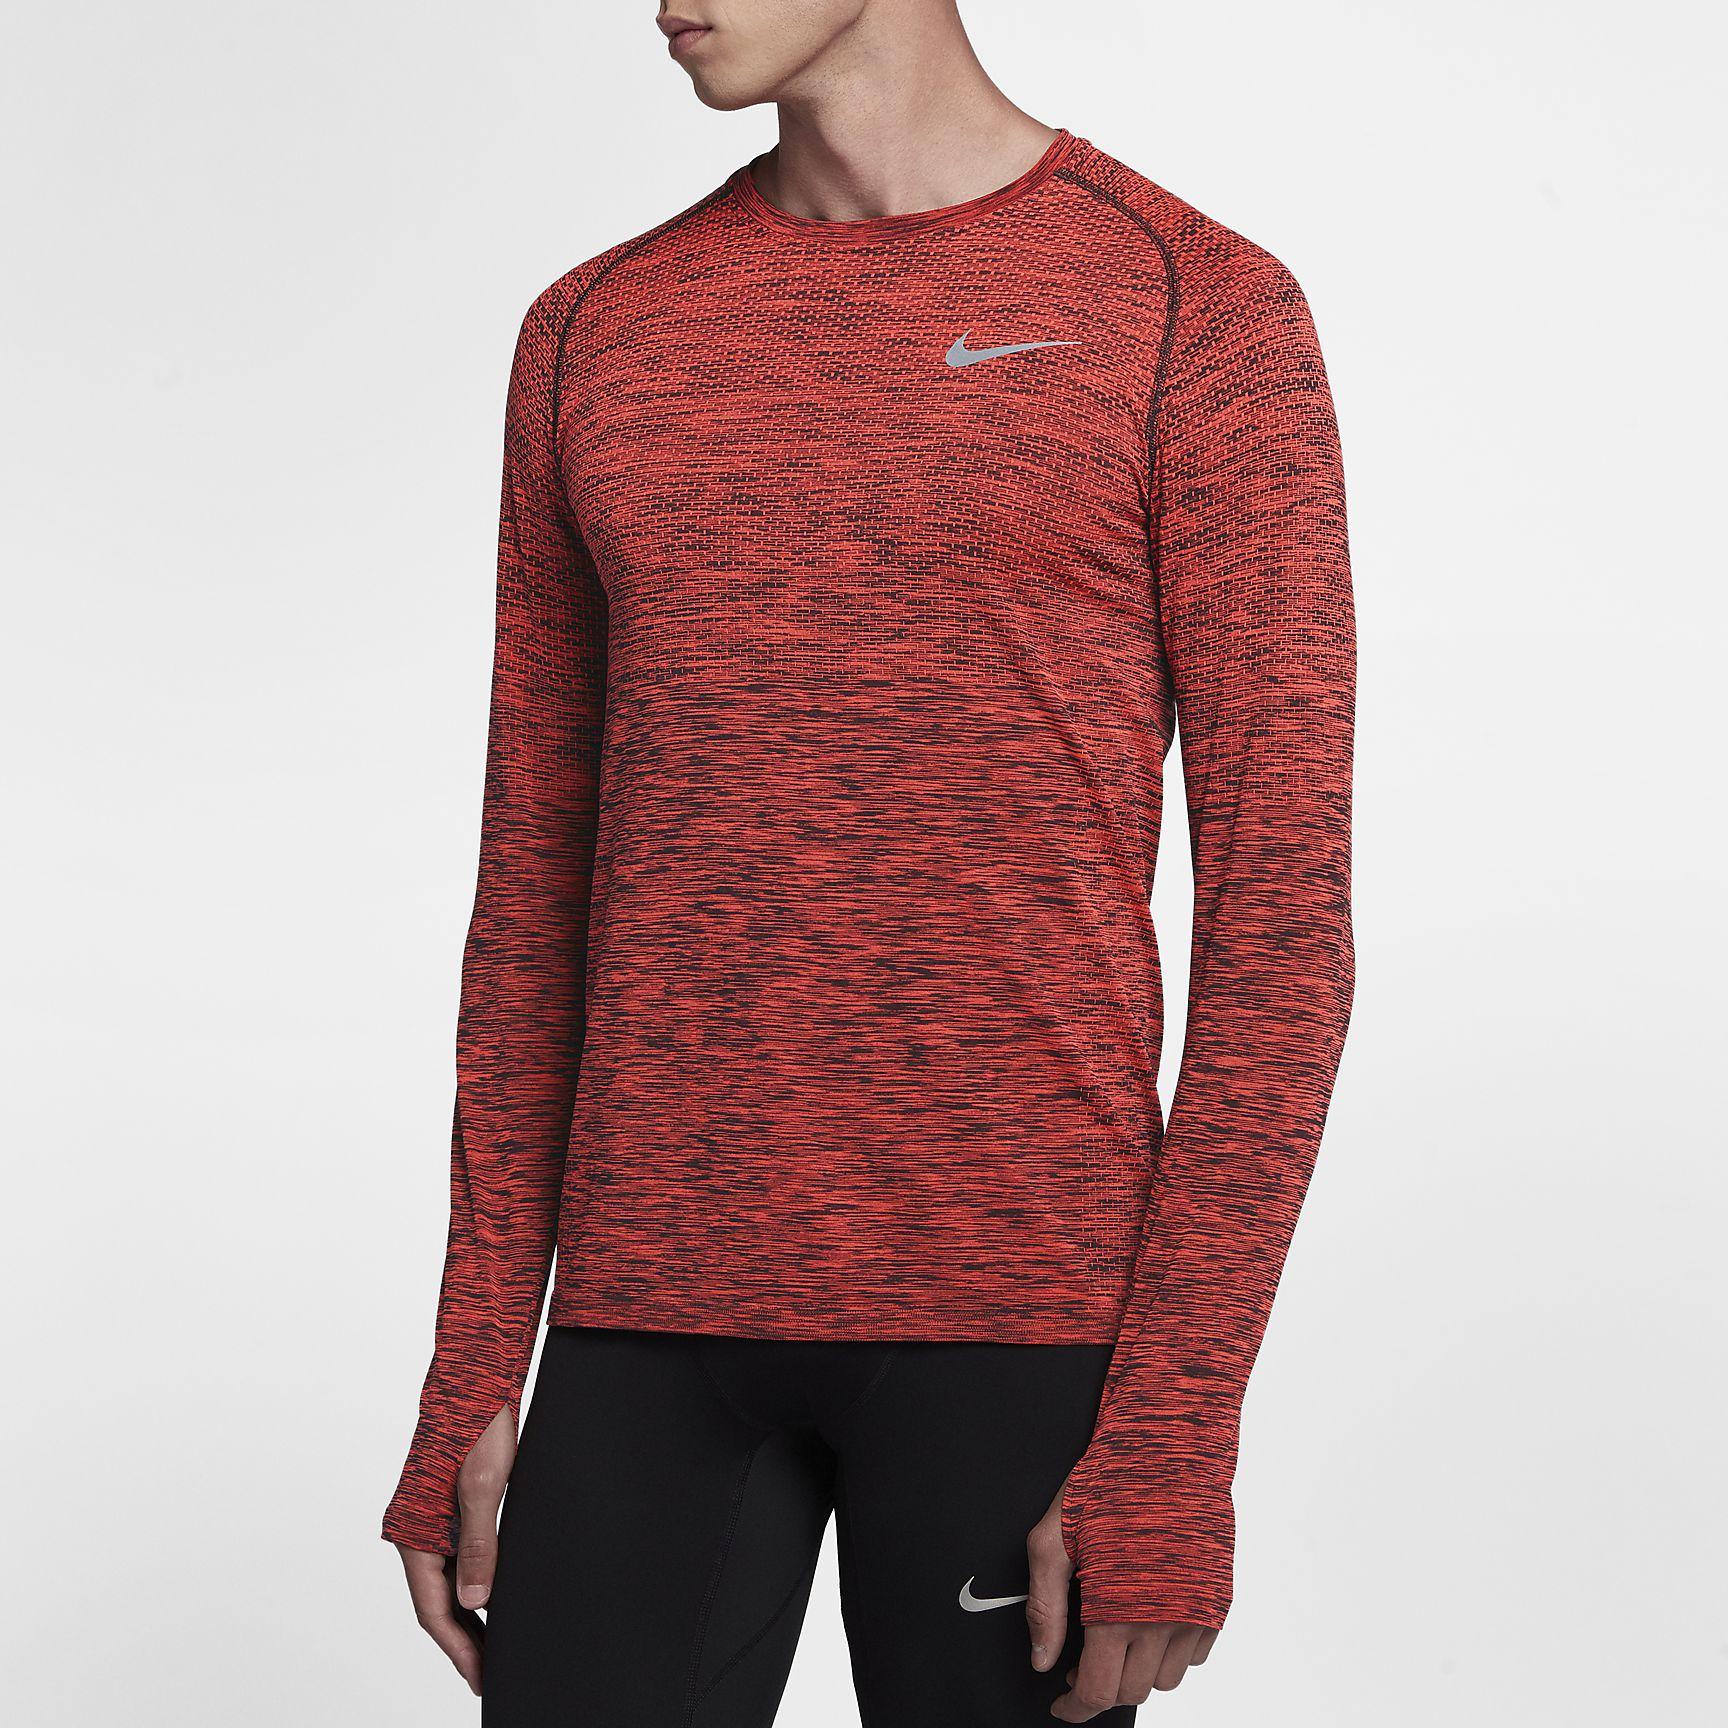 Nike Dri-Fit Knit Long Sleeve Training Top